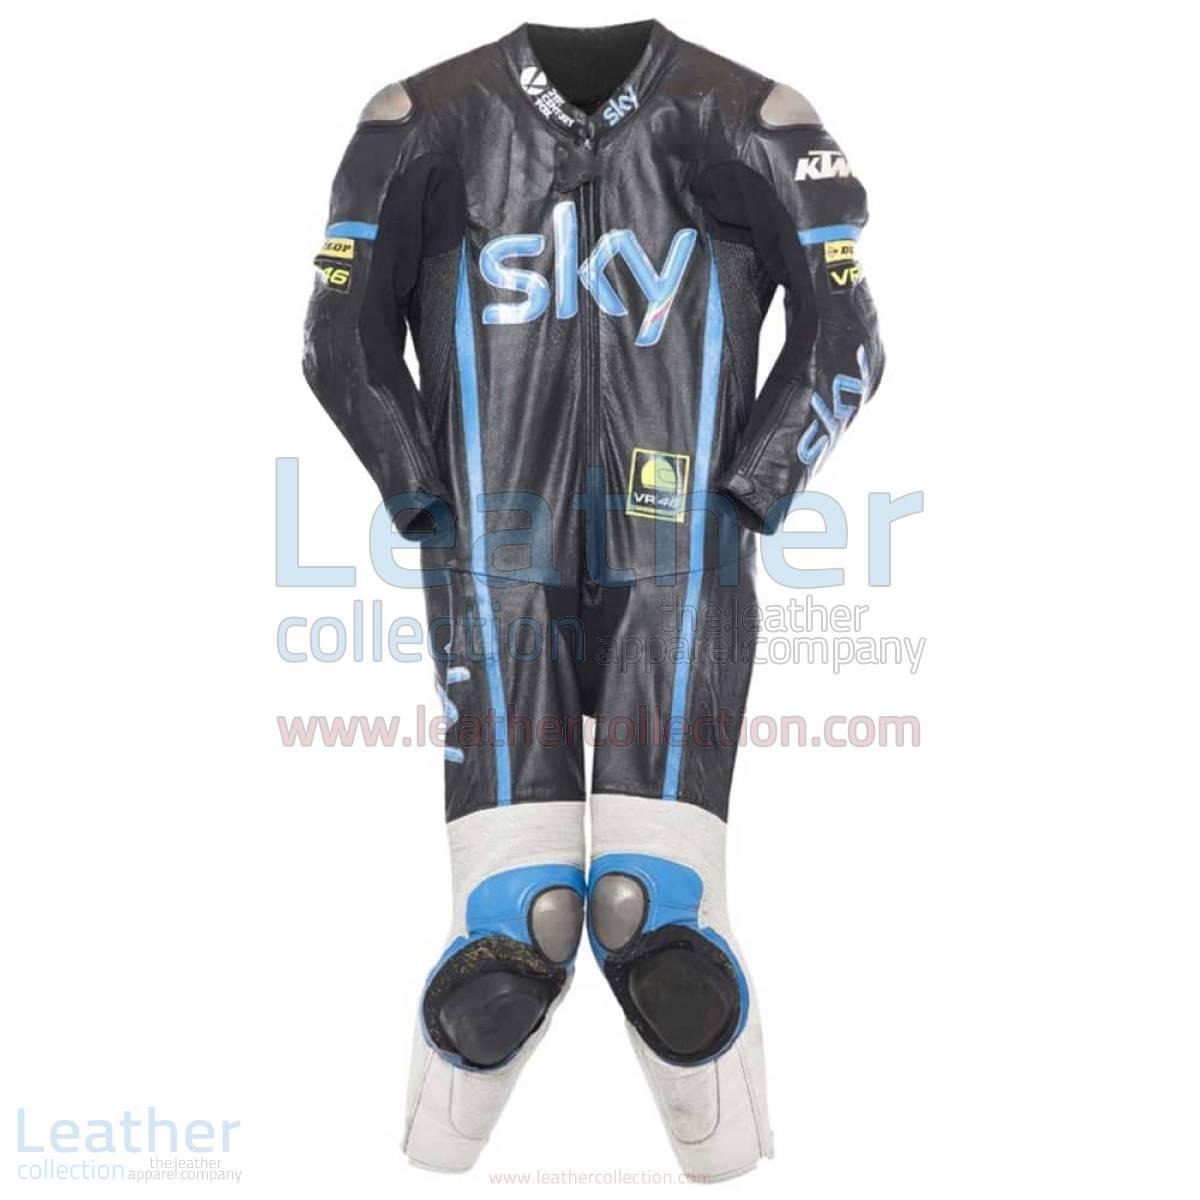 Romano Fenati KTM 2014 Race Suit – KTM Suit